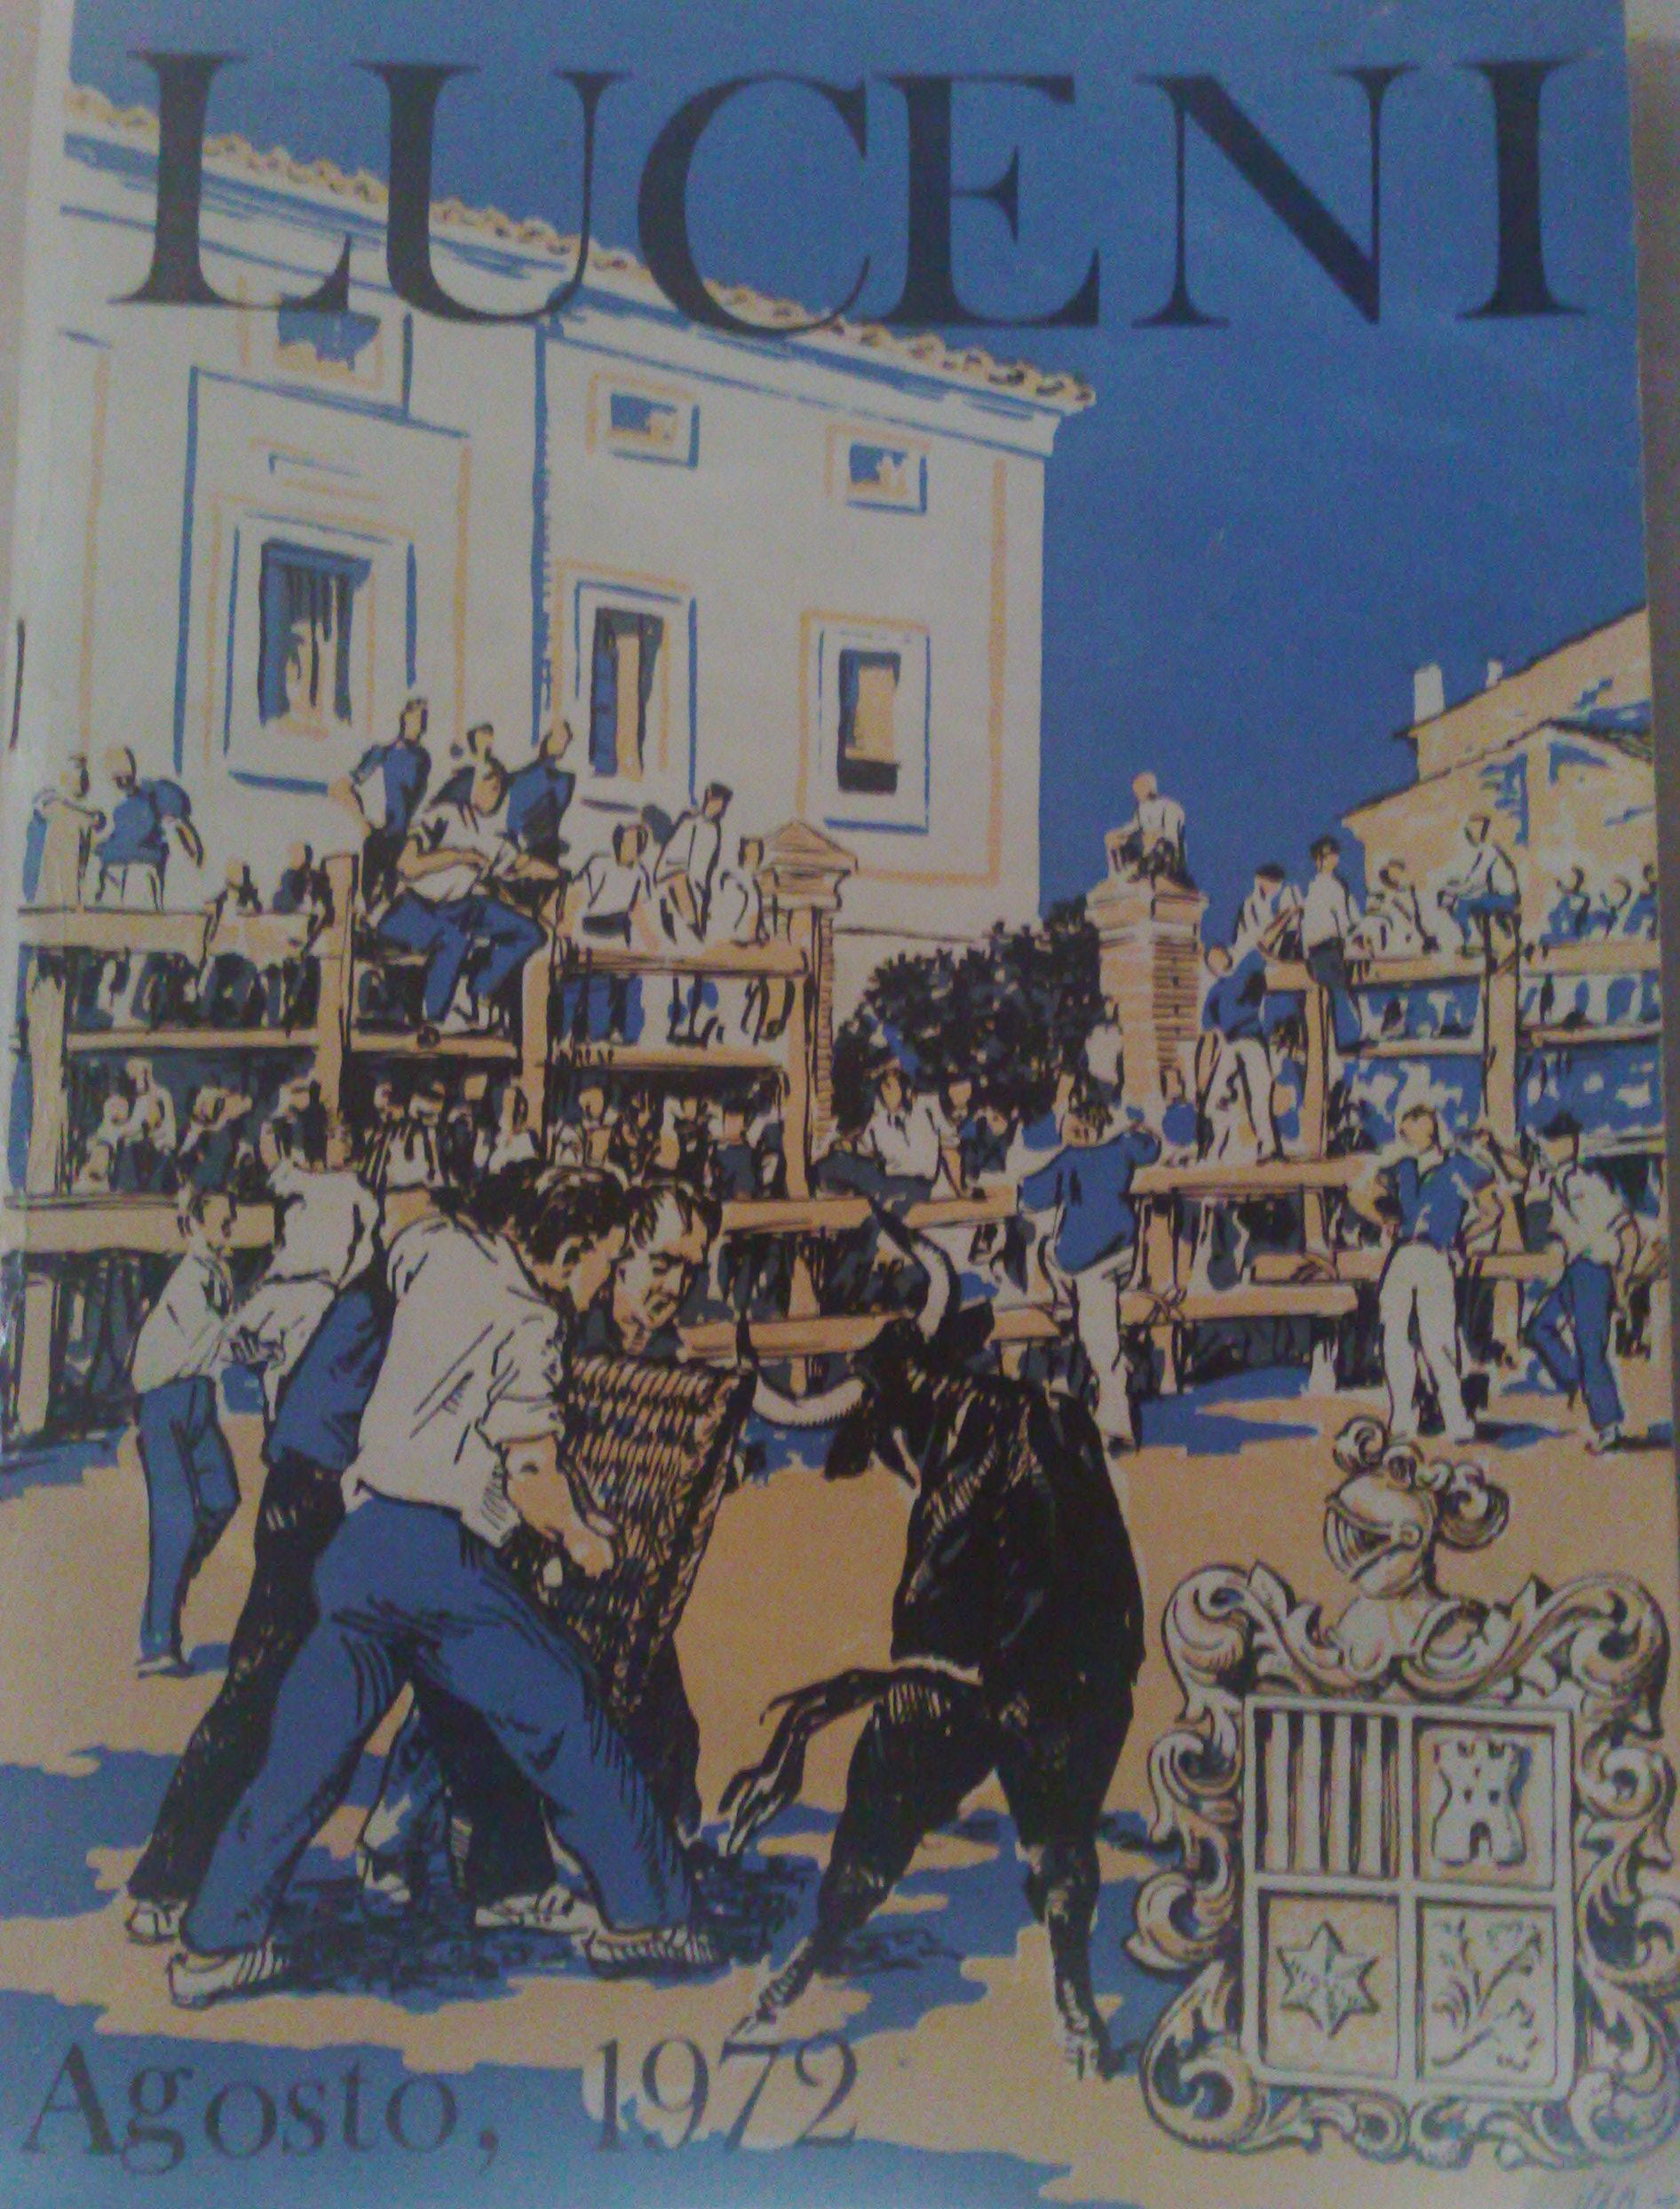 programa de fiestas - Luceni 1972